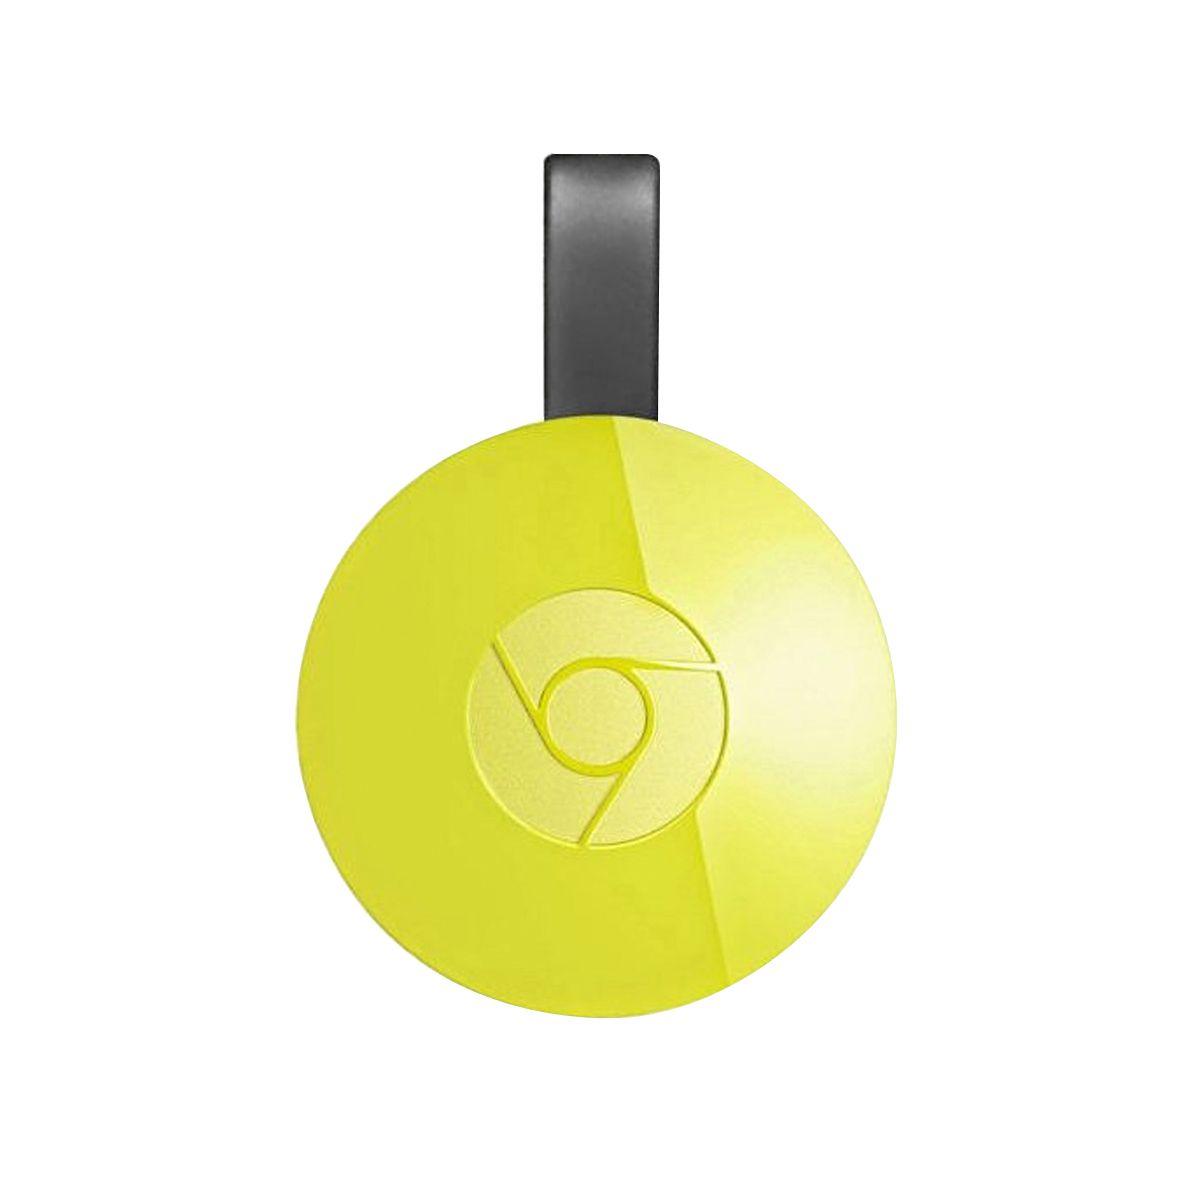 Chromecast 2 Hdmi Full Hd Netflix Original Colors Open Box - AMARELO